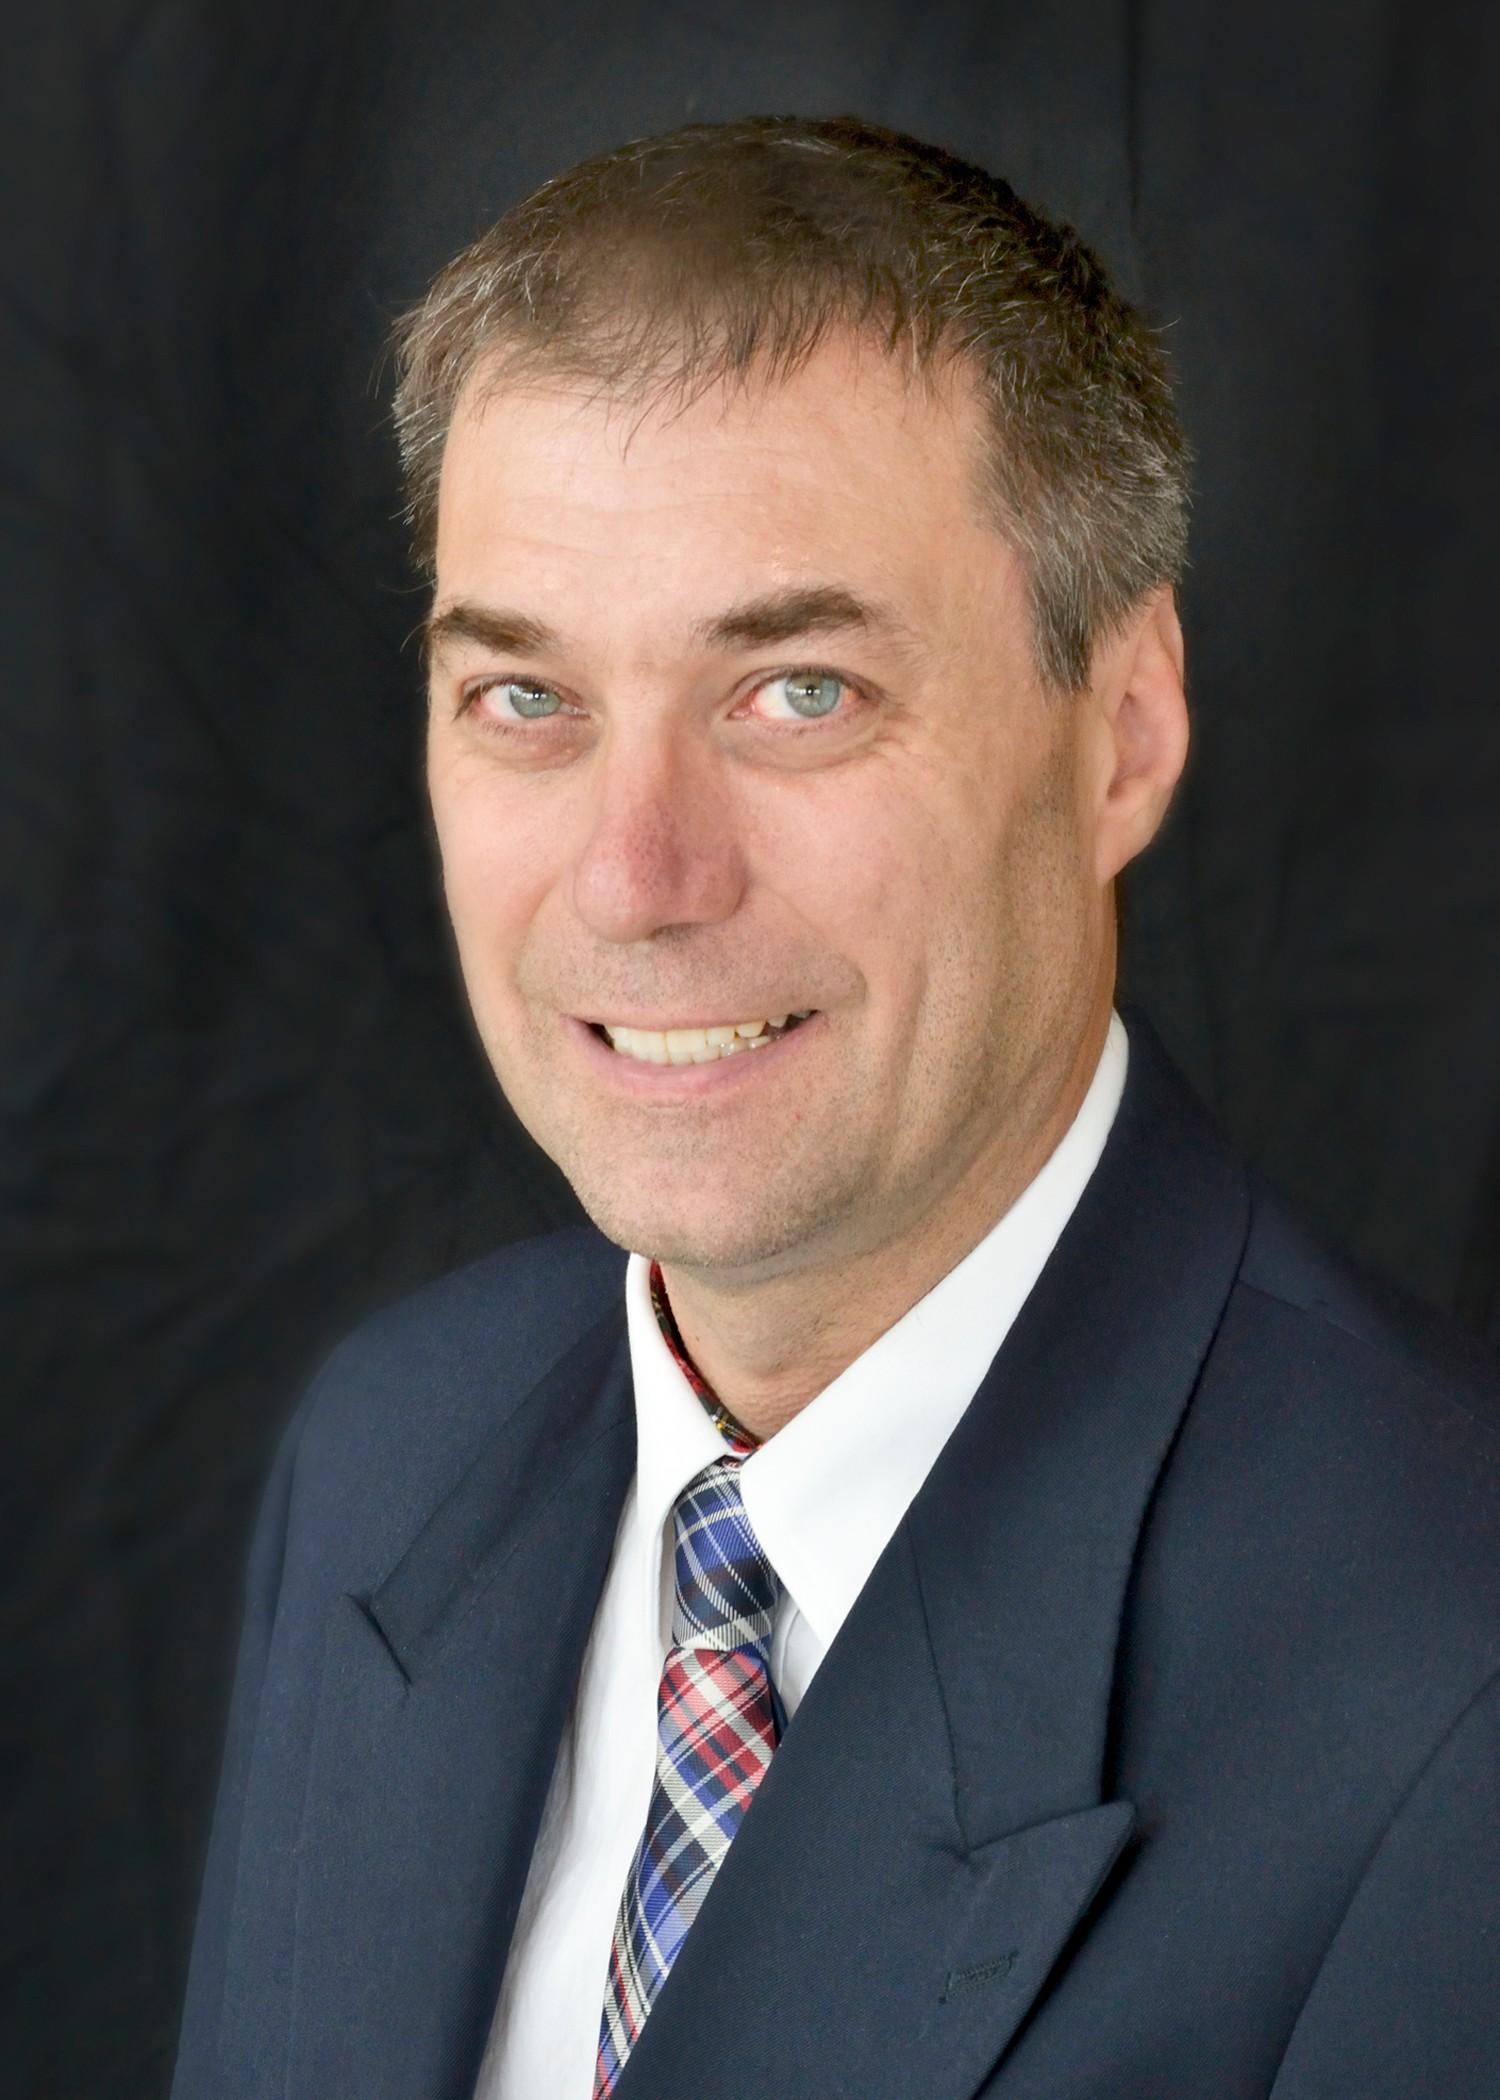 Jeff Solheim